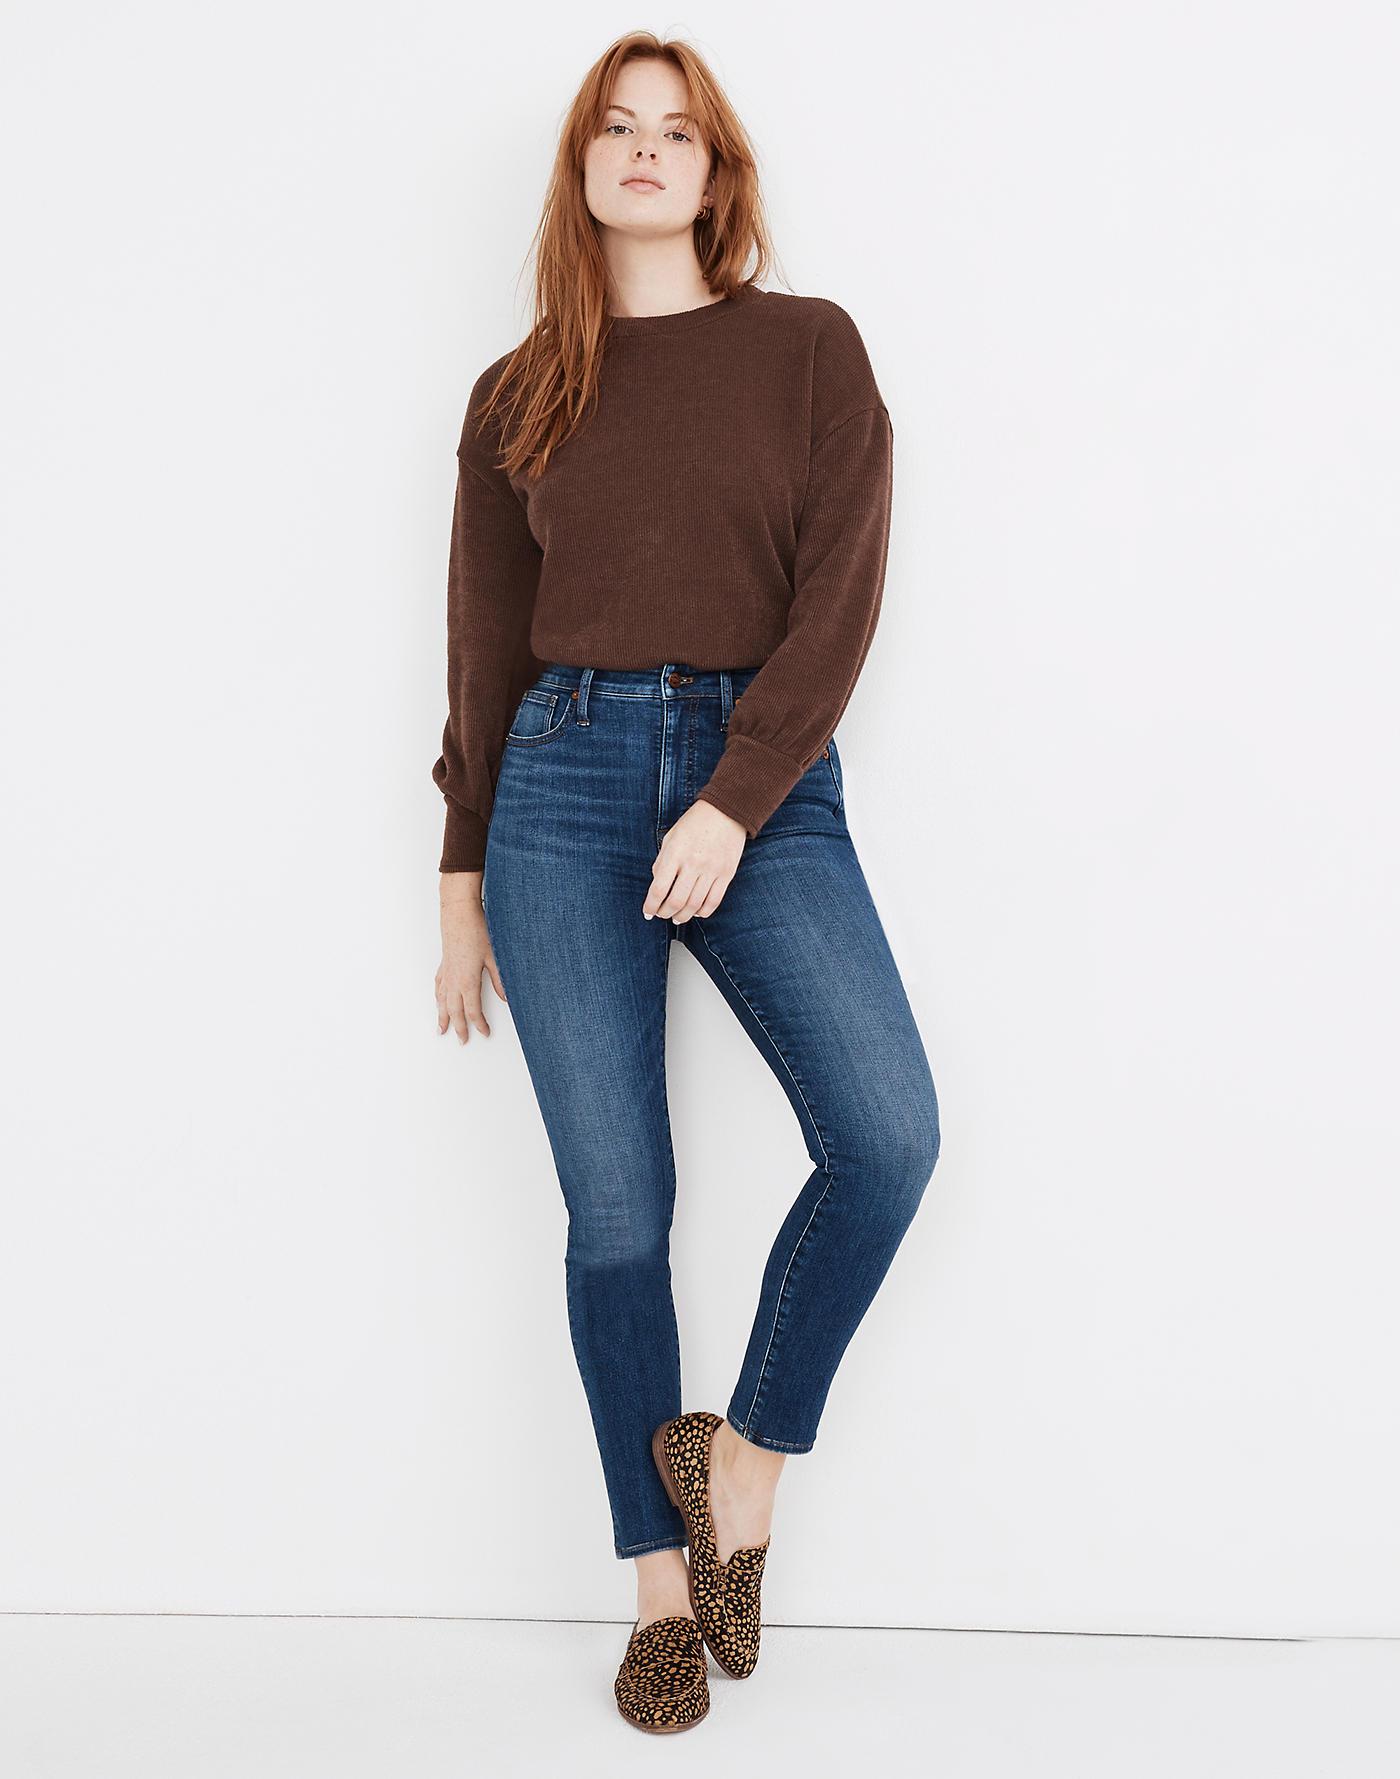 Madewell Curvy High-Rise Skinny Jeans in Bradshaw Wash